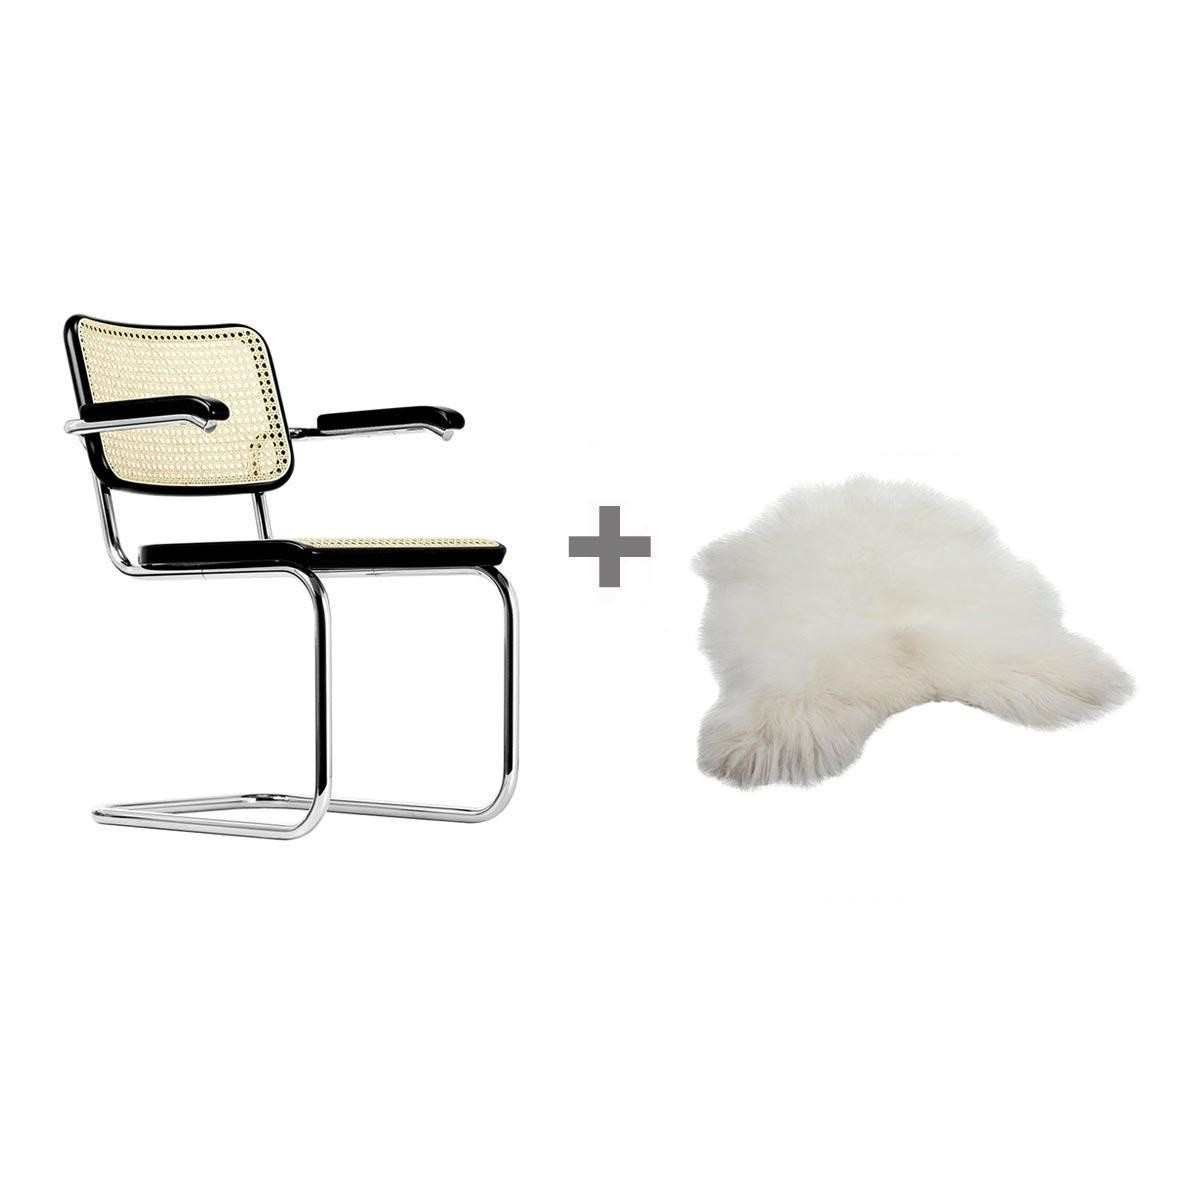 aktionsset thonet s 64 freischwinger fell thonet. Black Bedroom Furniture Sets. Home Design Ideas